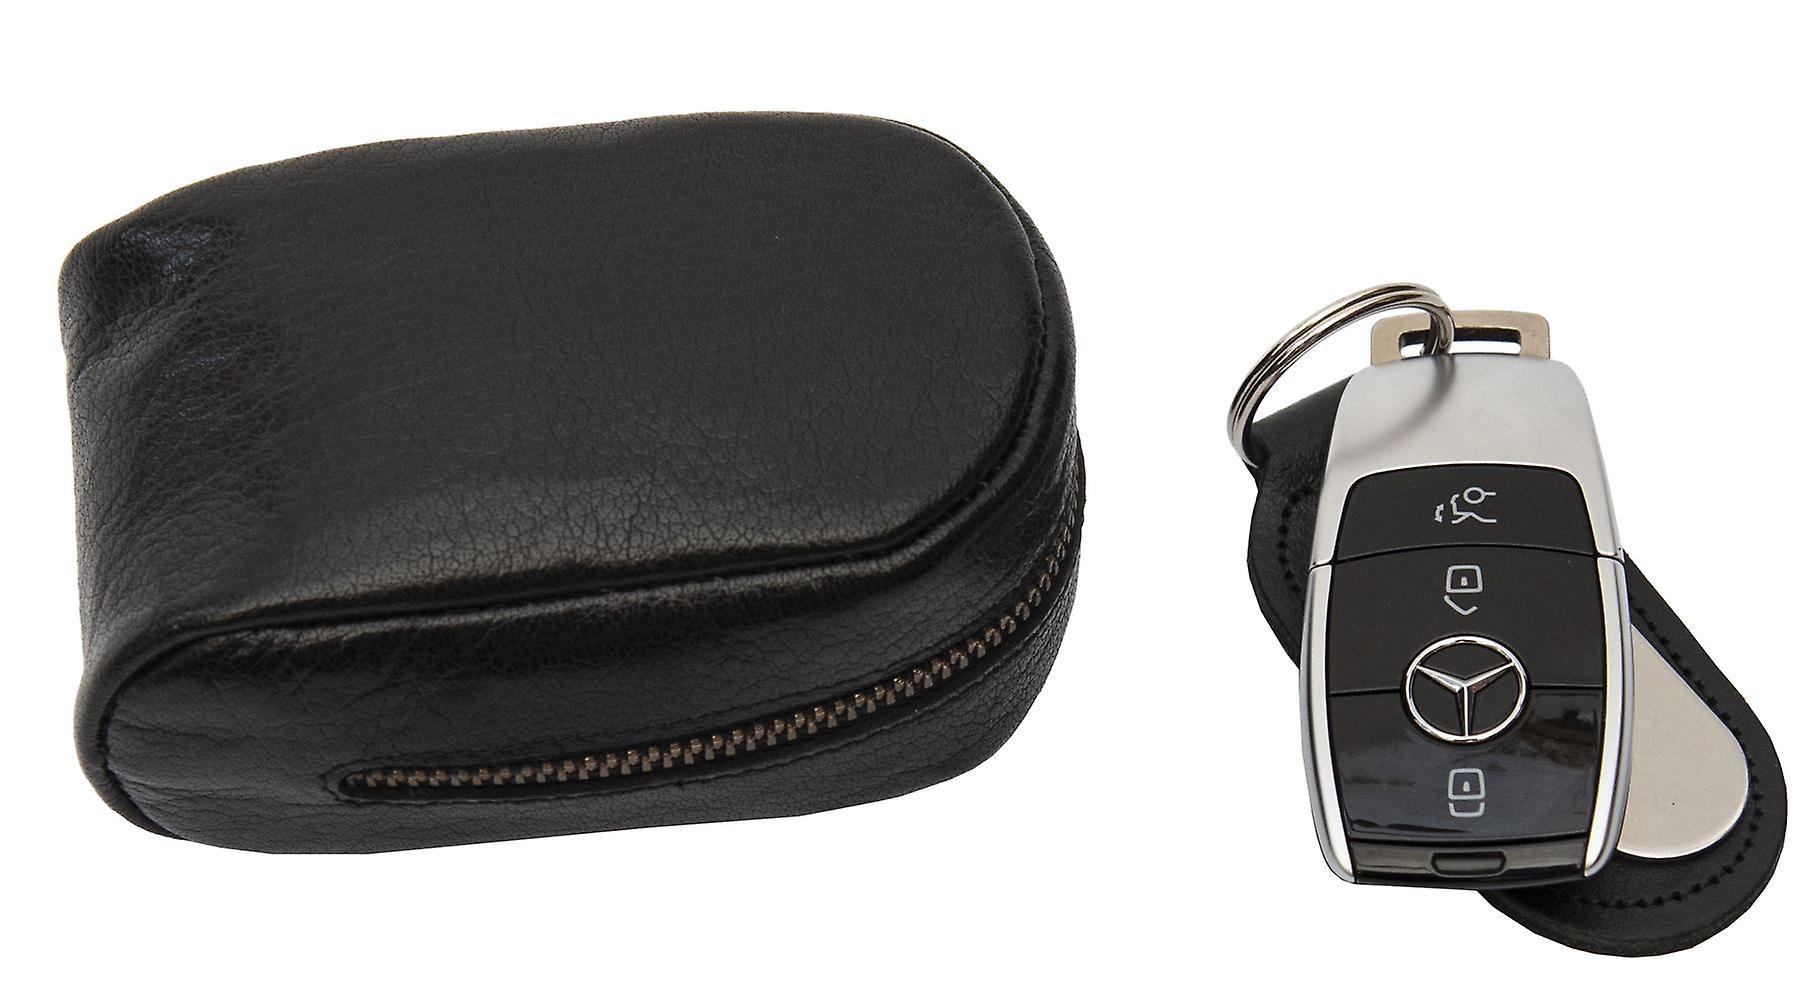 RFID Blocking Secure Zip Round Key Protector Primehide Premium Leather Key Pouch Key Wallet 4824